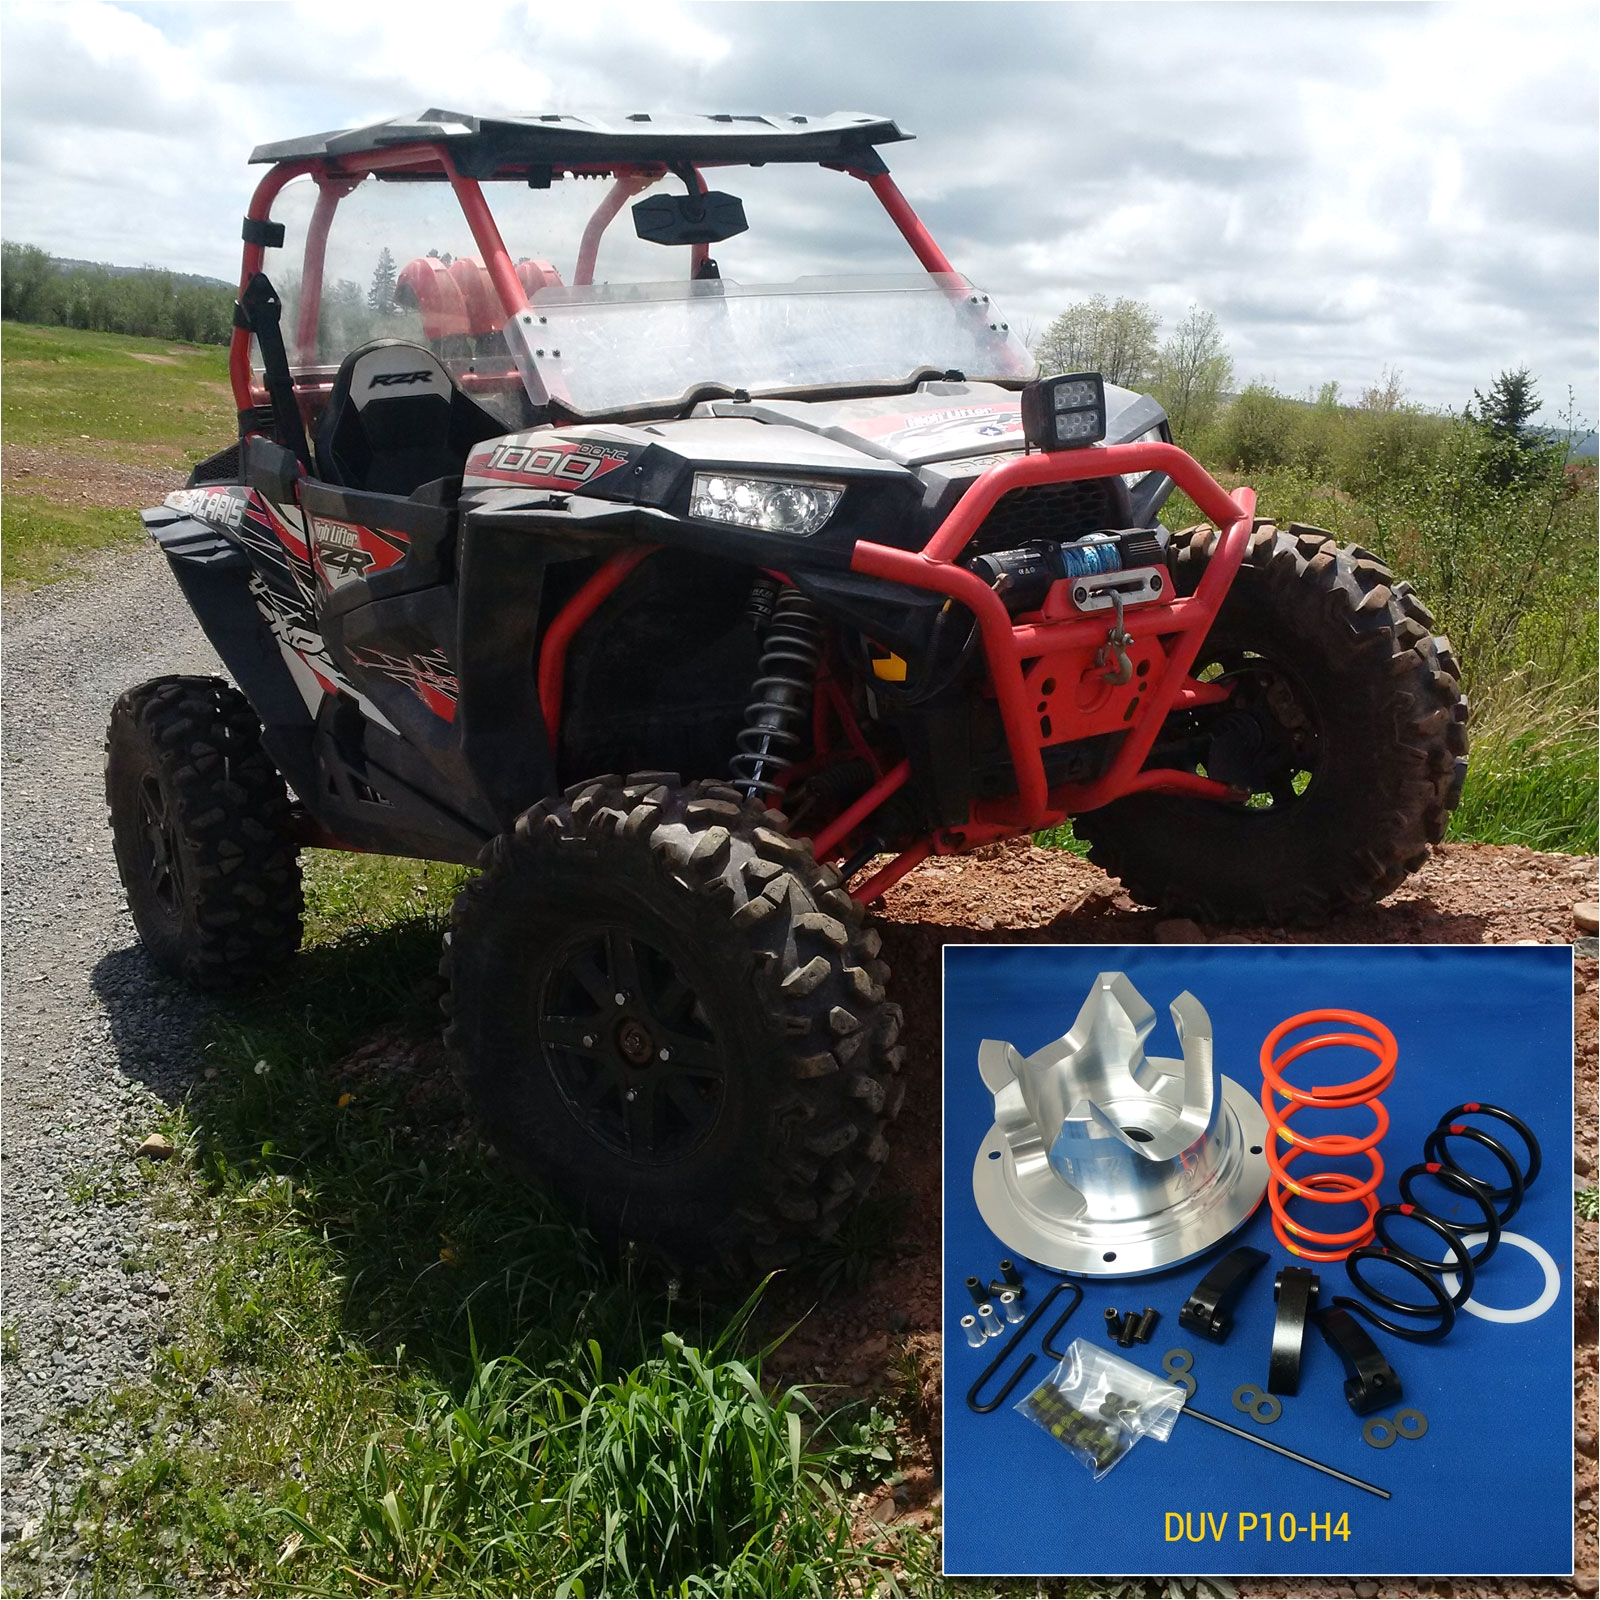 dalton pro adjustable clutch kit for polaris rzr xp4 1000 2016 2018 4 seat only